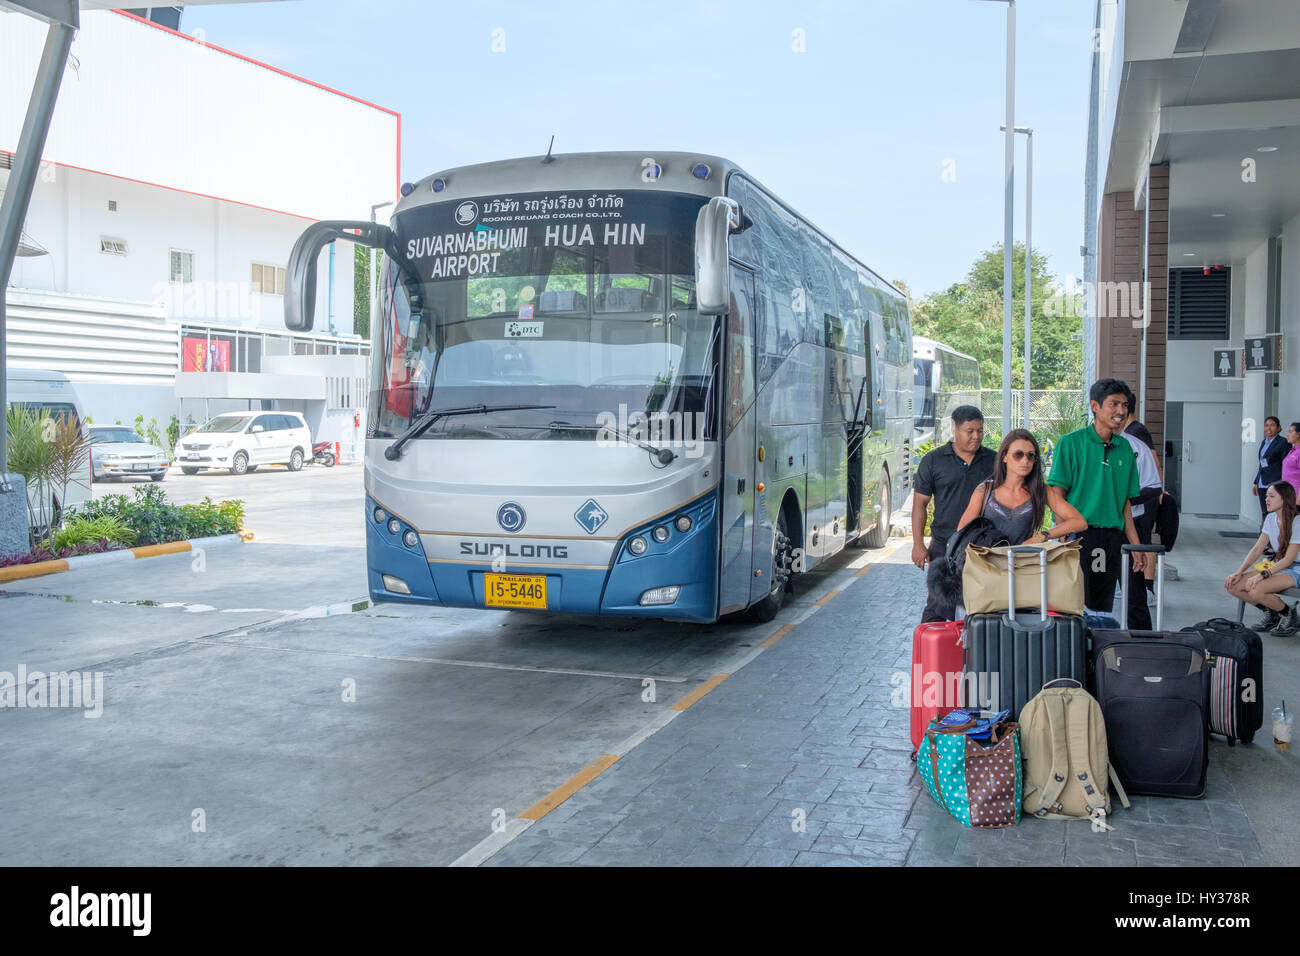 Airport bus from Hua Hin to Suvarnabhumi - Stock Image